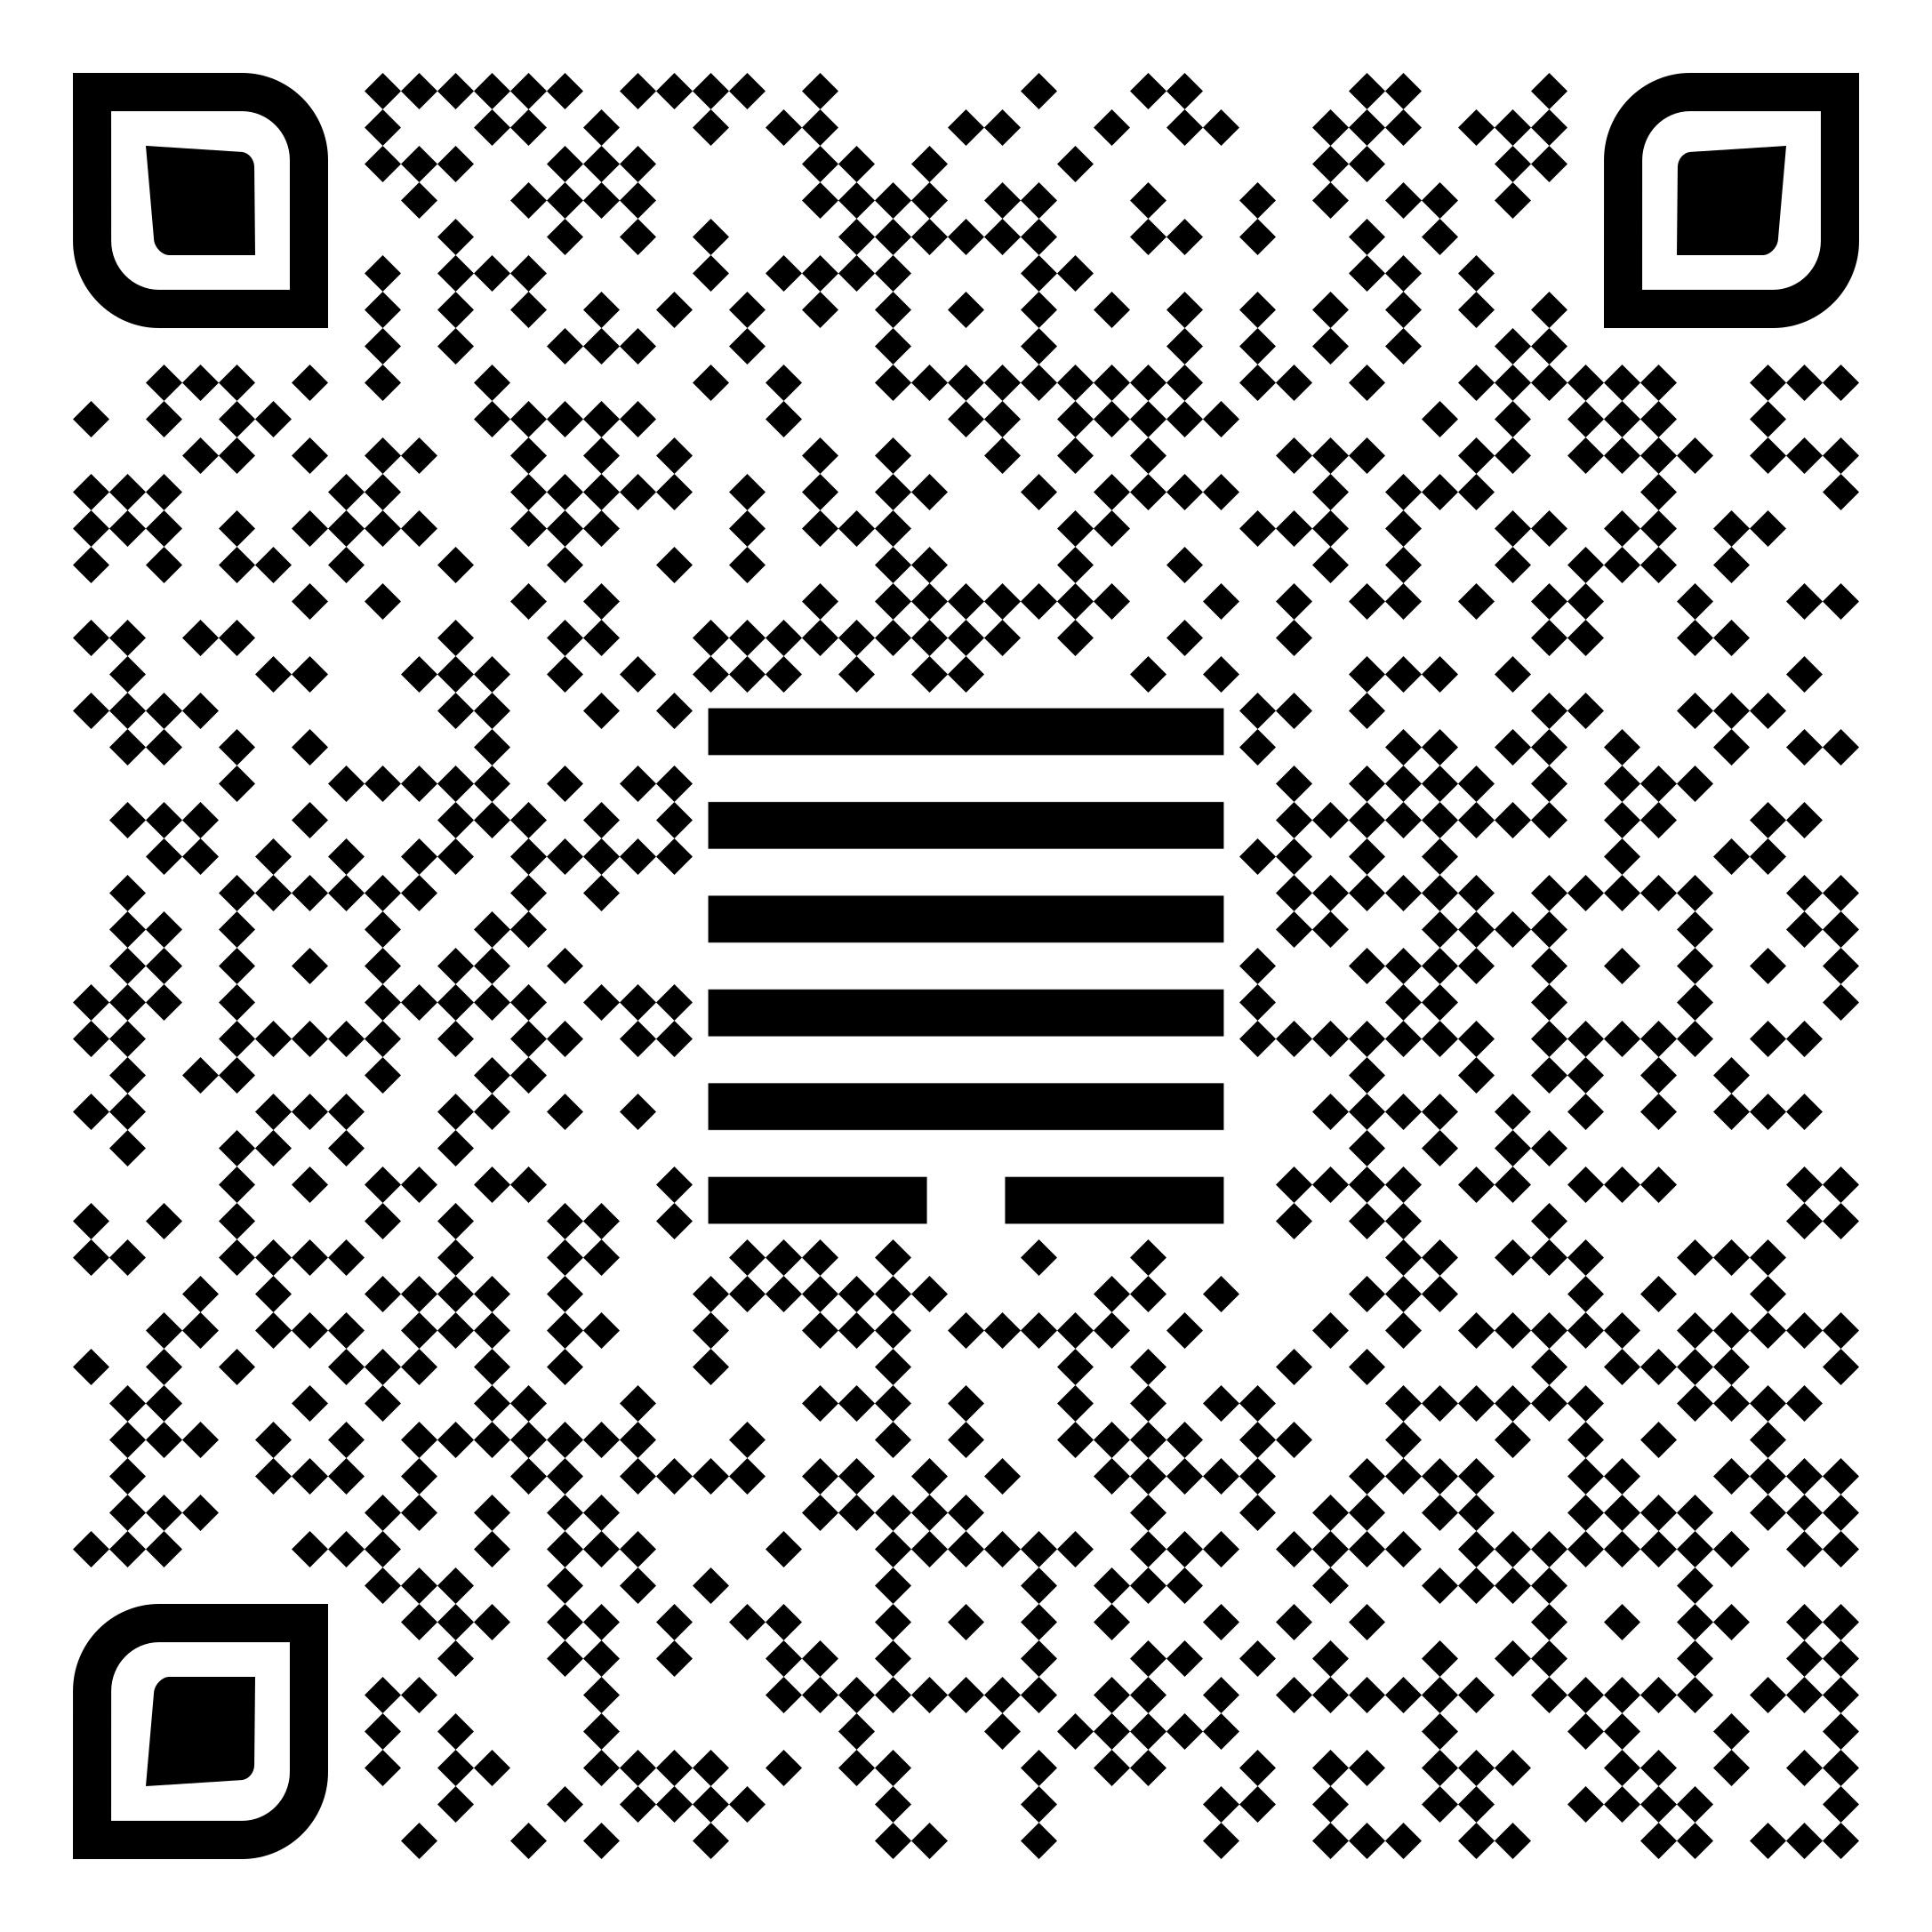 qr-code-44.png